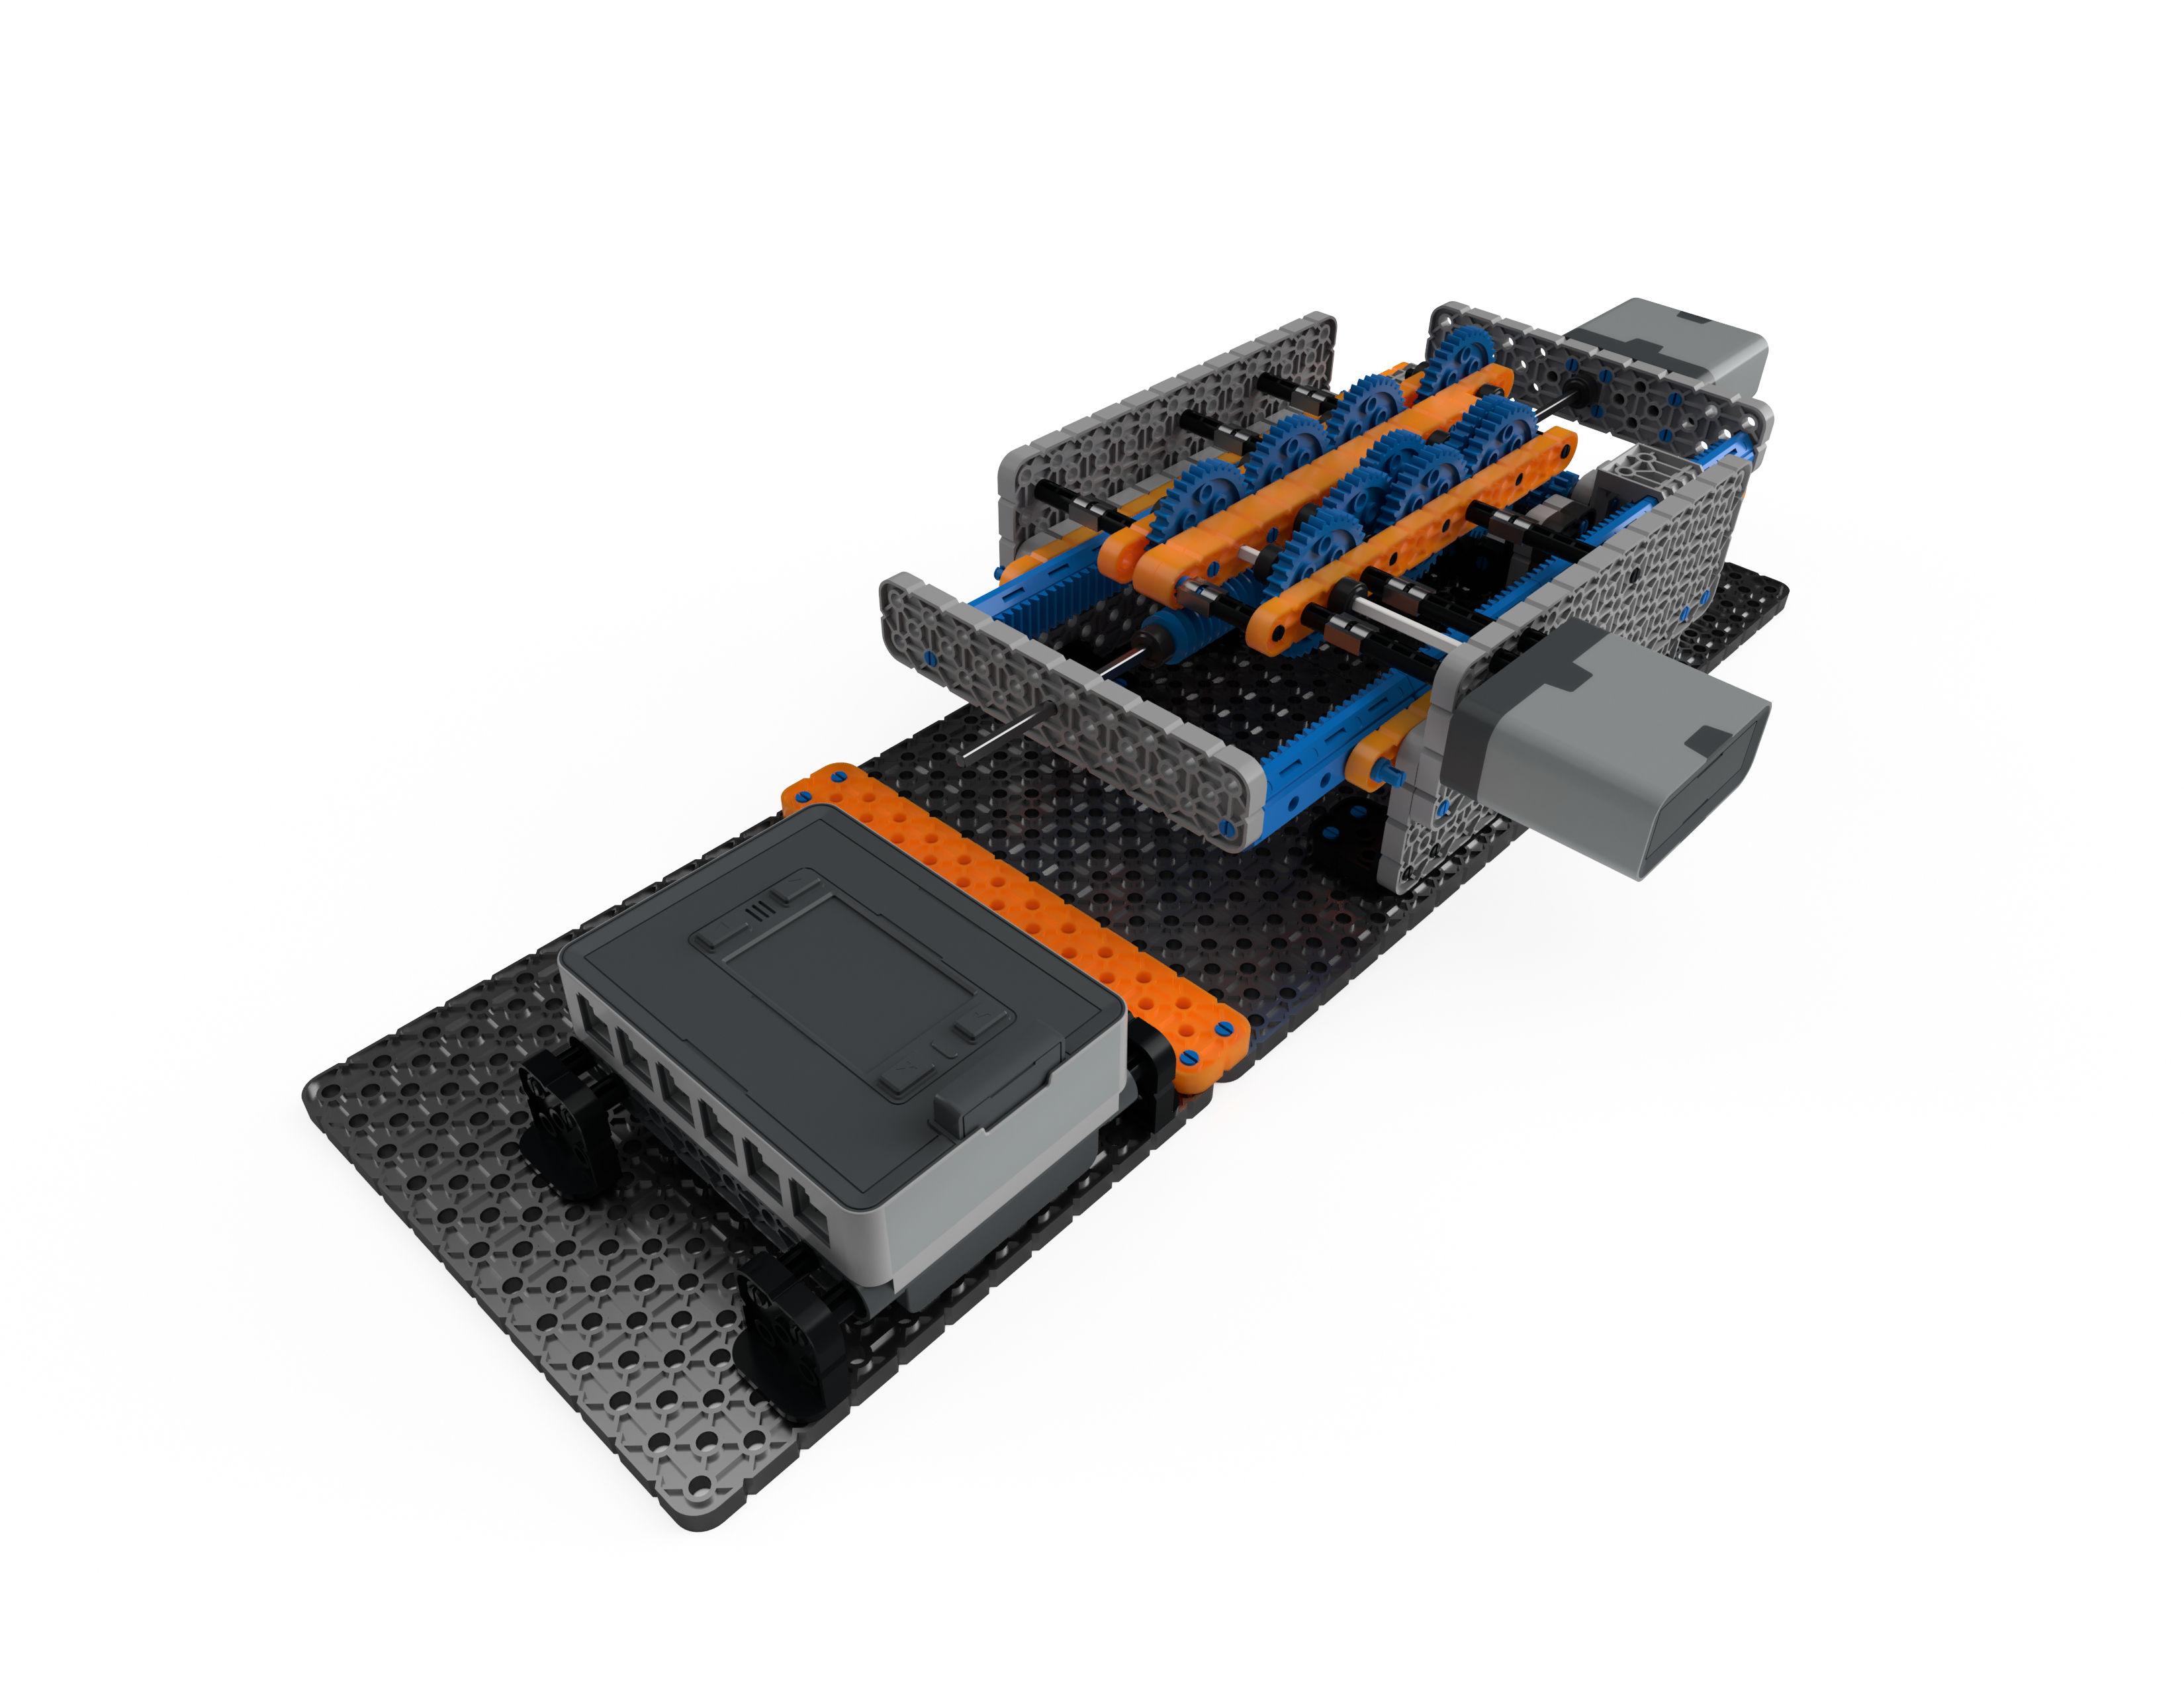 Dynamics---vex-iq-robotics-2018-feb-15-02-08-56pm-000-customizedview25397041219-jpeg-3500-3500